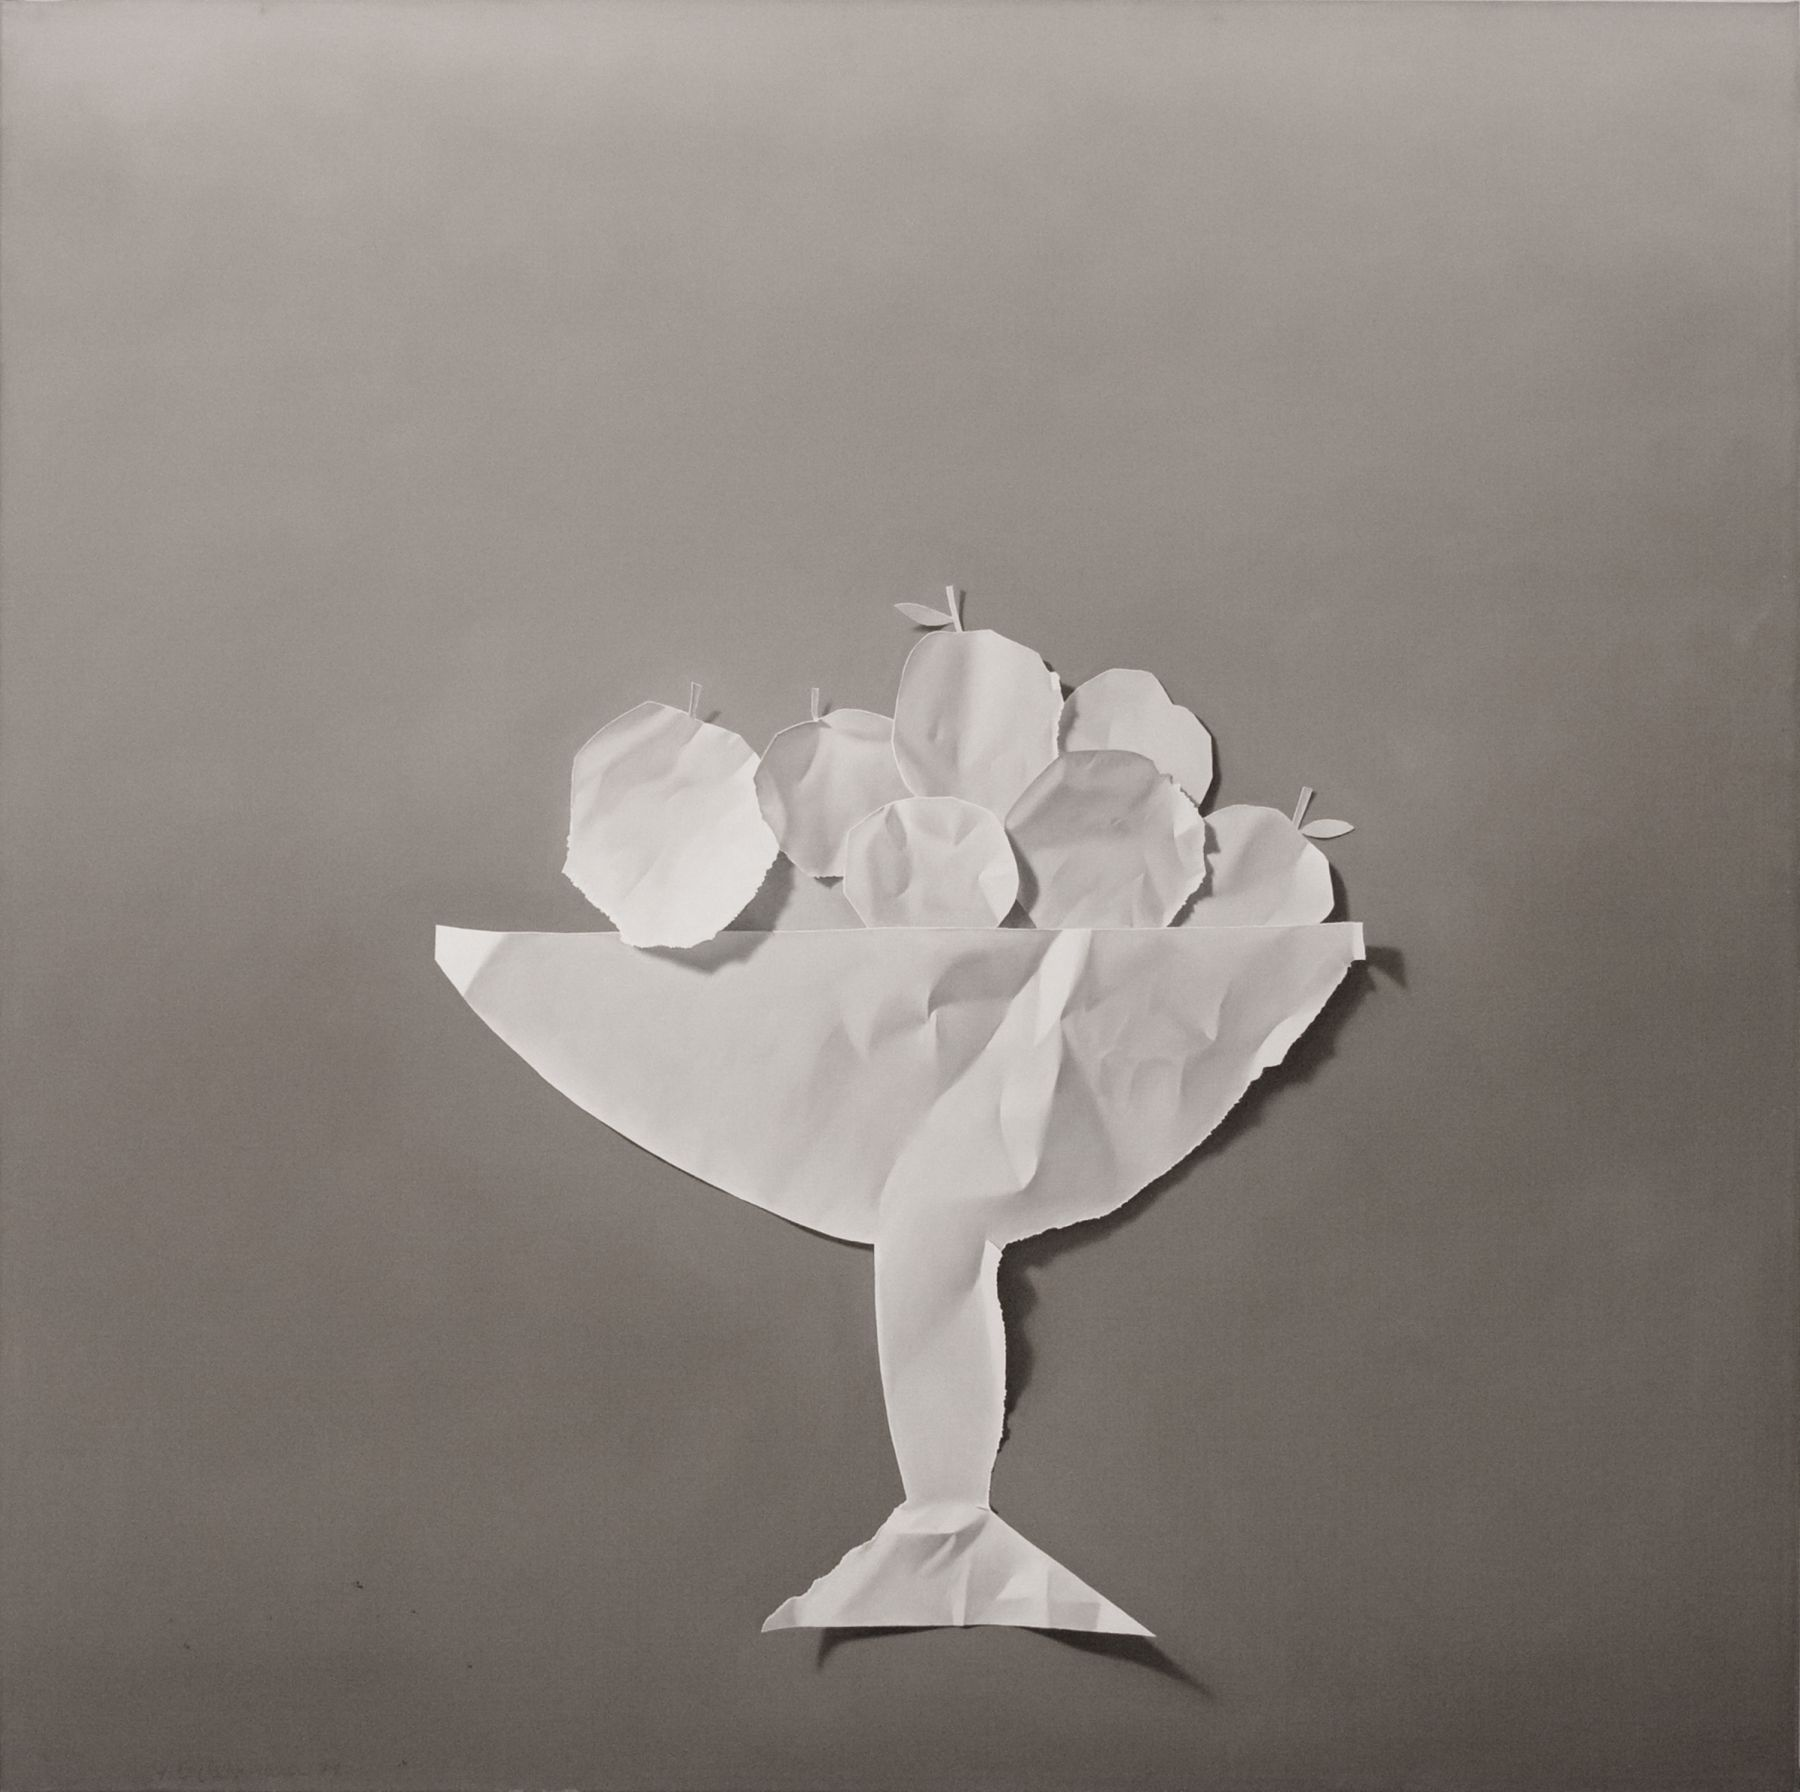 Yrjö Edelmann, Paper Apples, 1979, oil on canvas, 39 1/2 x 39 1/2 inches